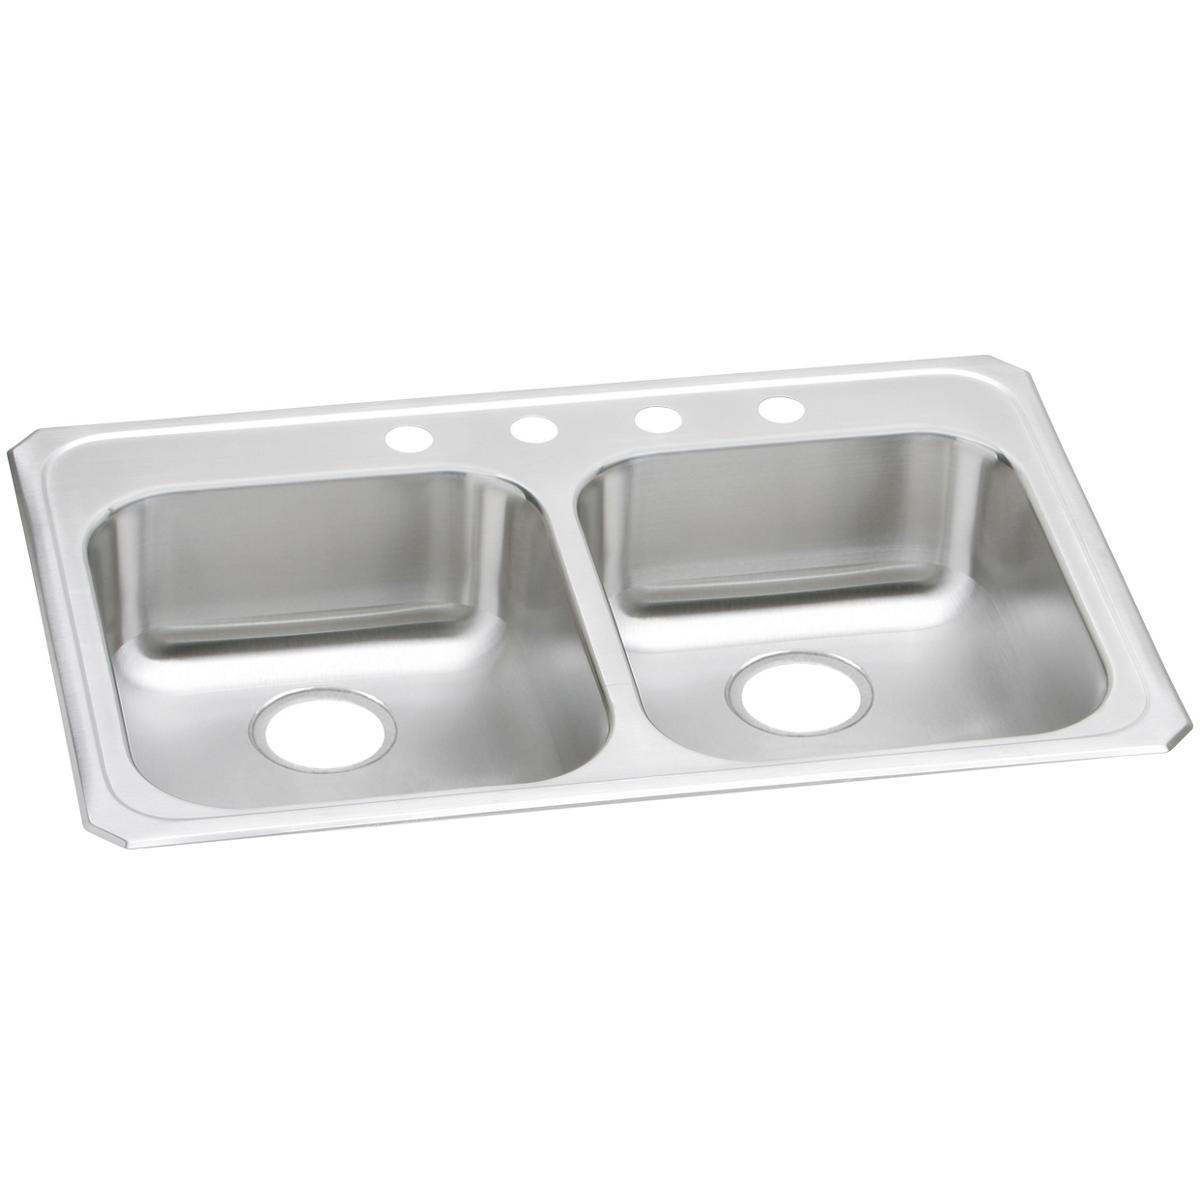 32 x 21 x 5 3 8 three hole 20 gauge elkay celebrity double bowl kitchen sink 3 1 2 drain opening self rimming ada compliant